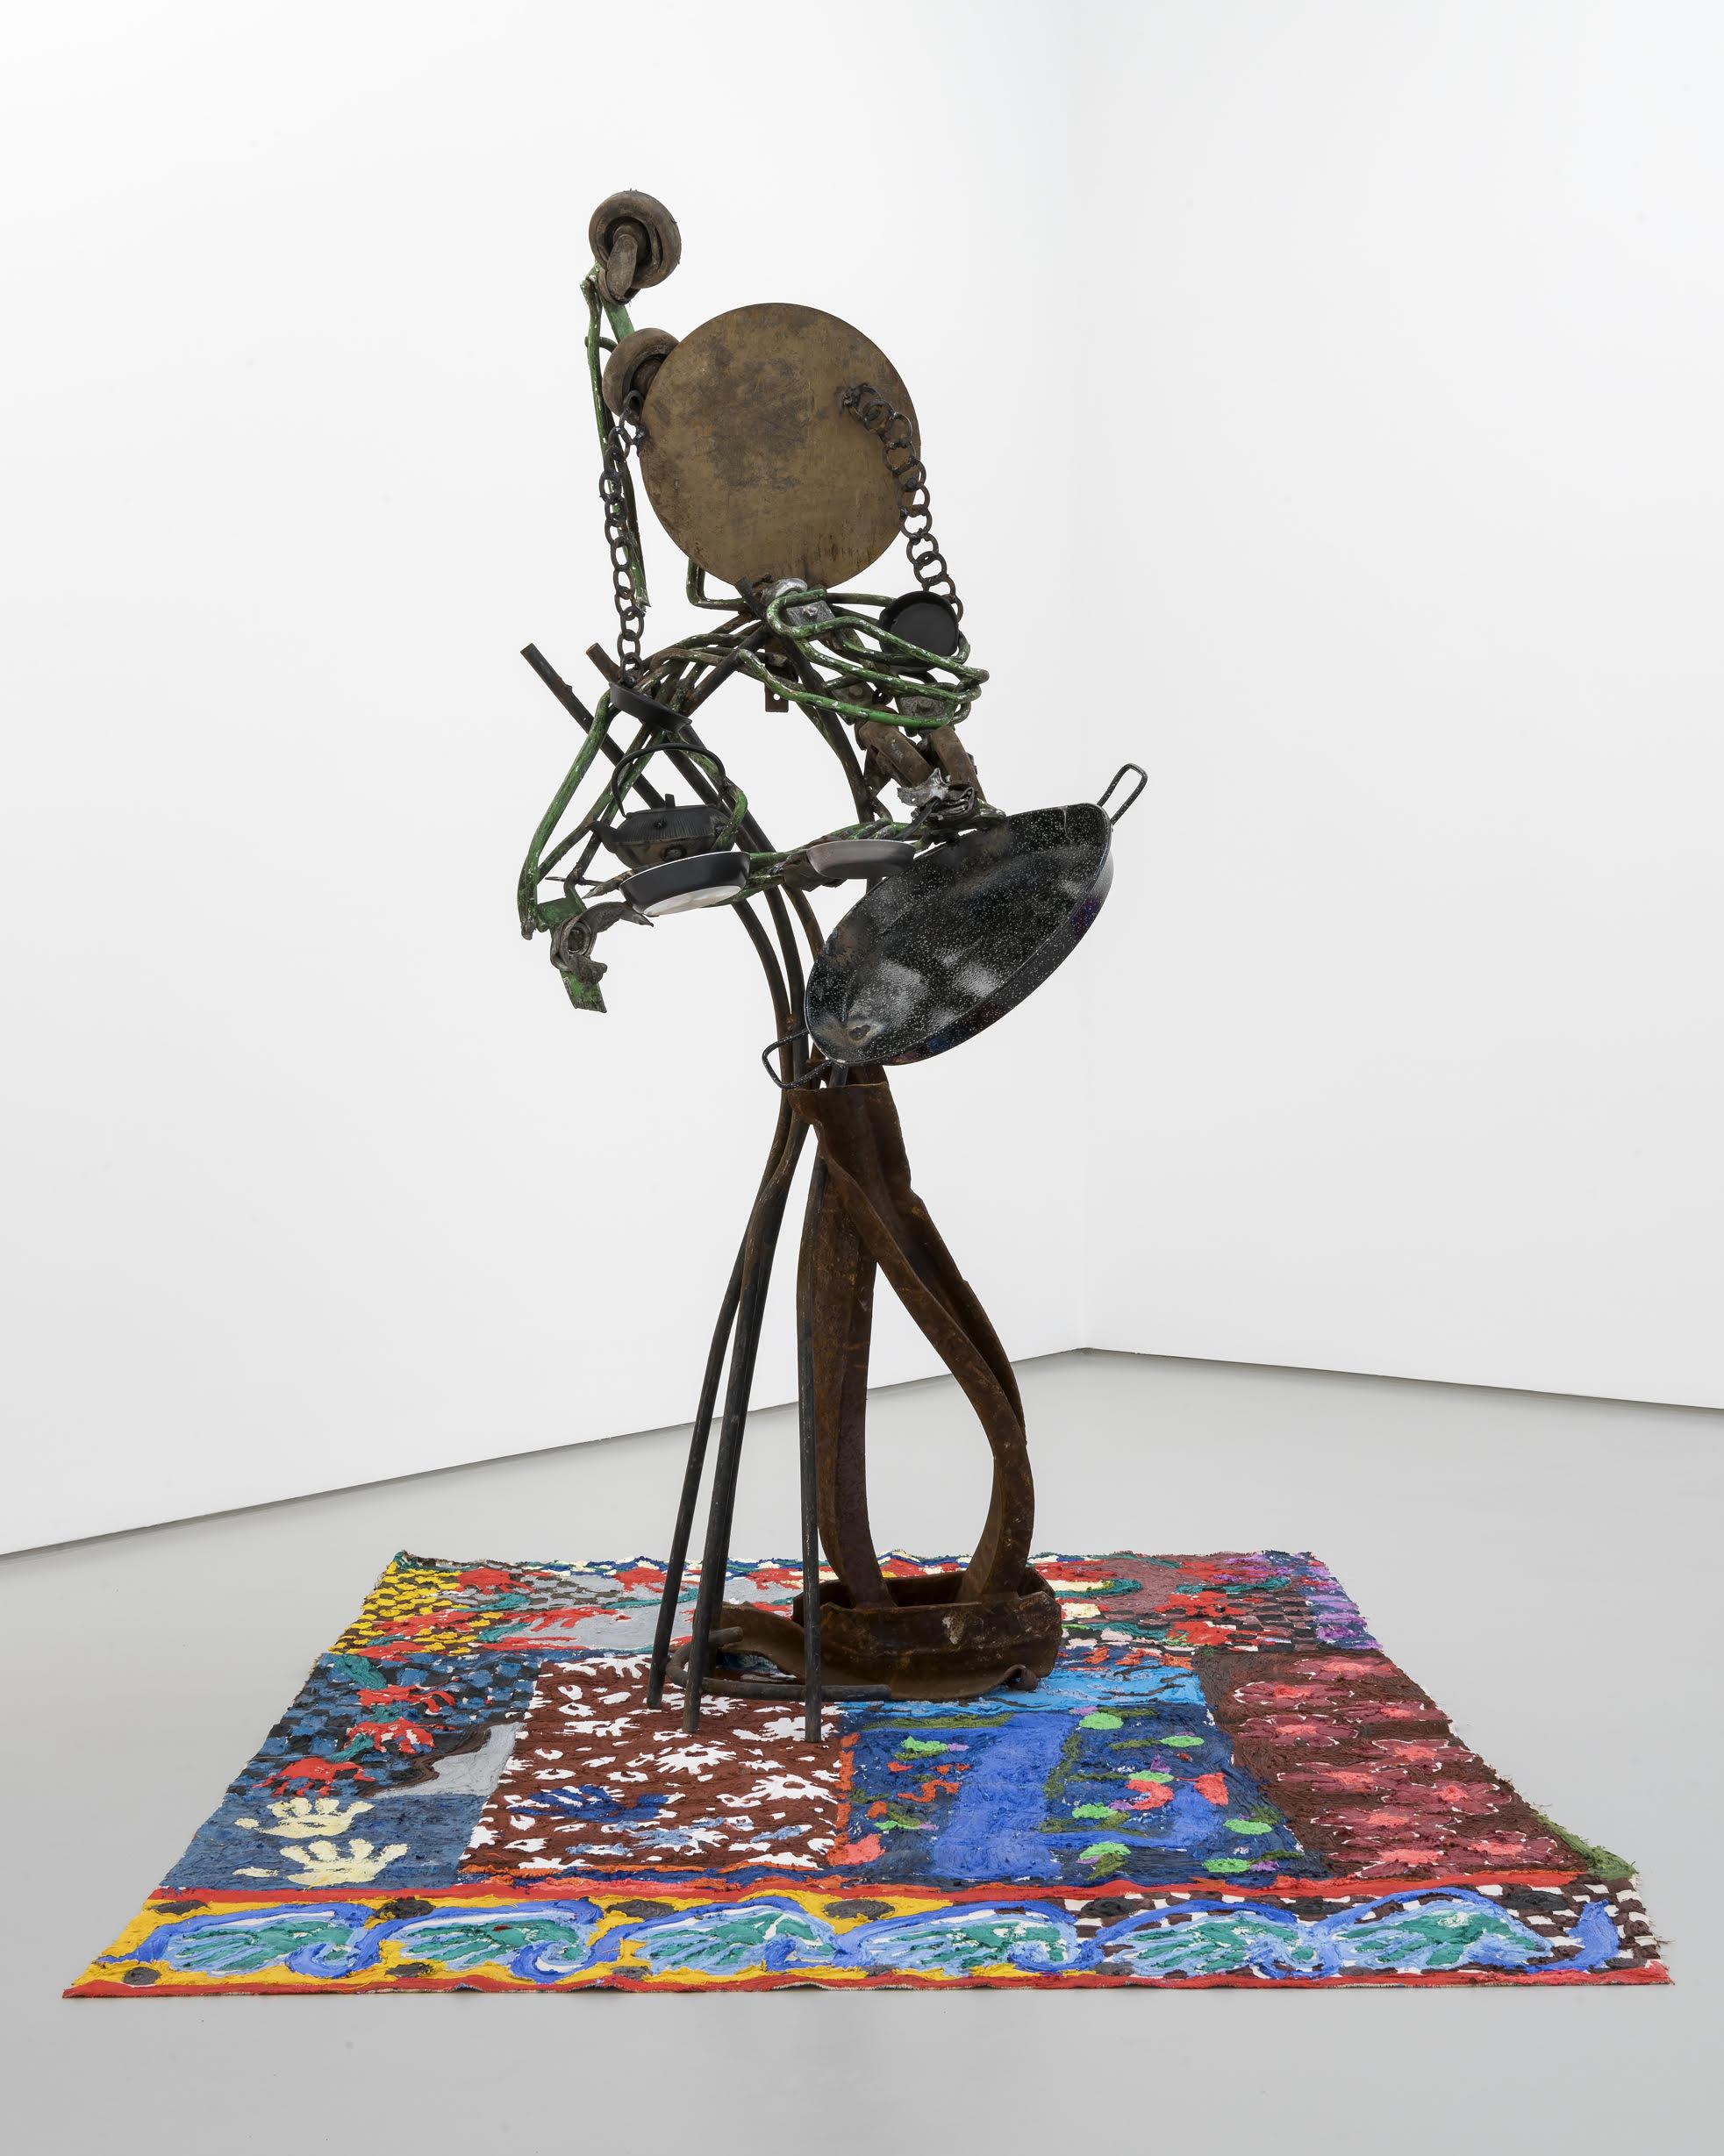 Ida Ekblad - Step Motherfucker, 2017. Welded iron, metal, rubber wheels, plastisol and puff paint on cotton (197 x 85 x 125 cm)